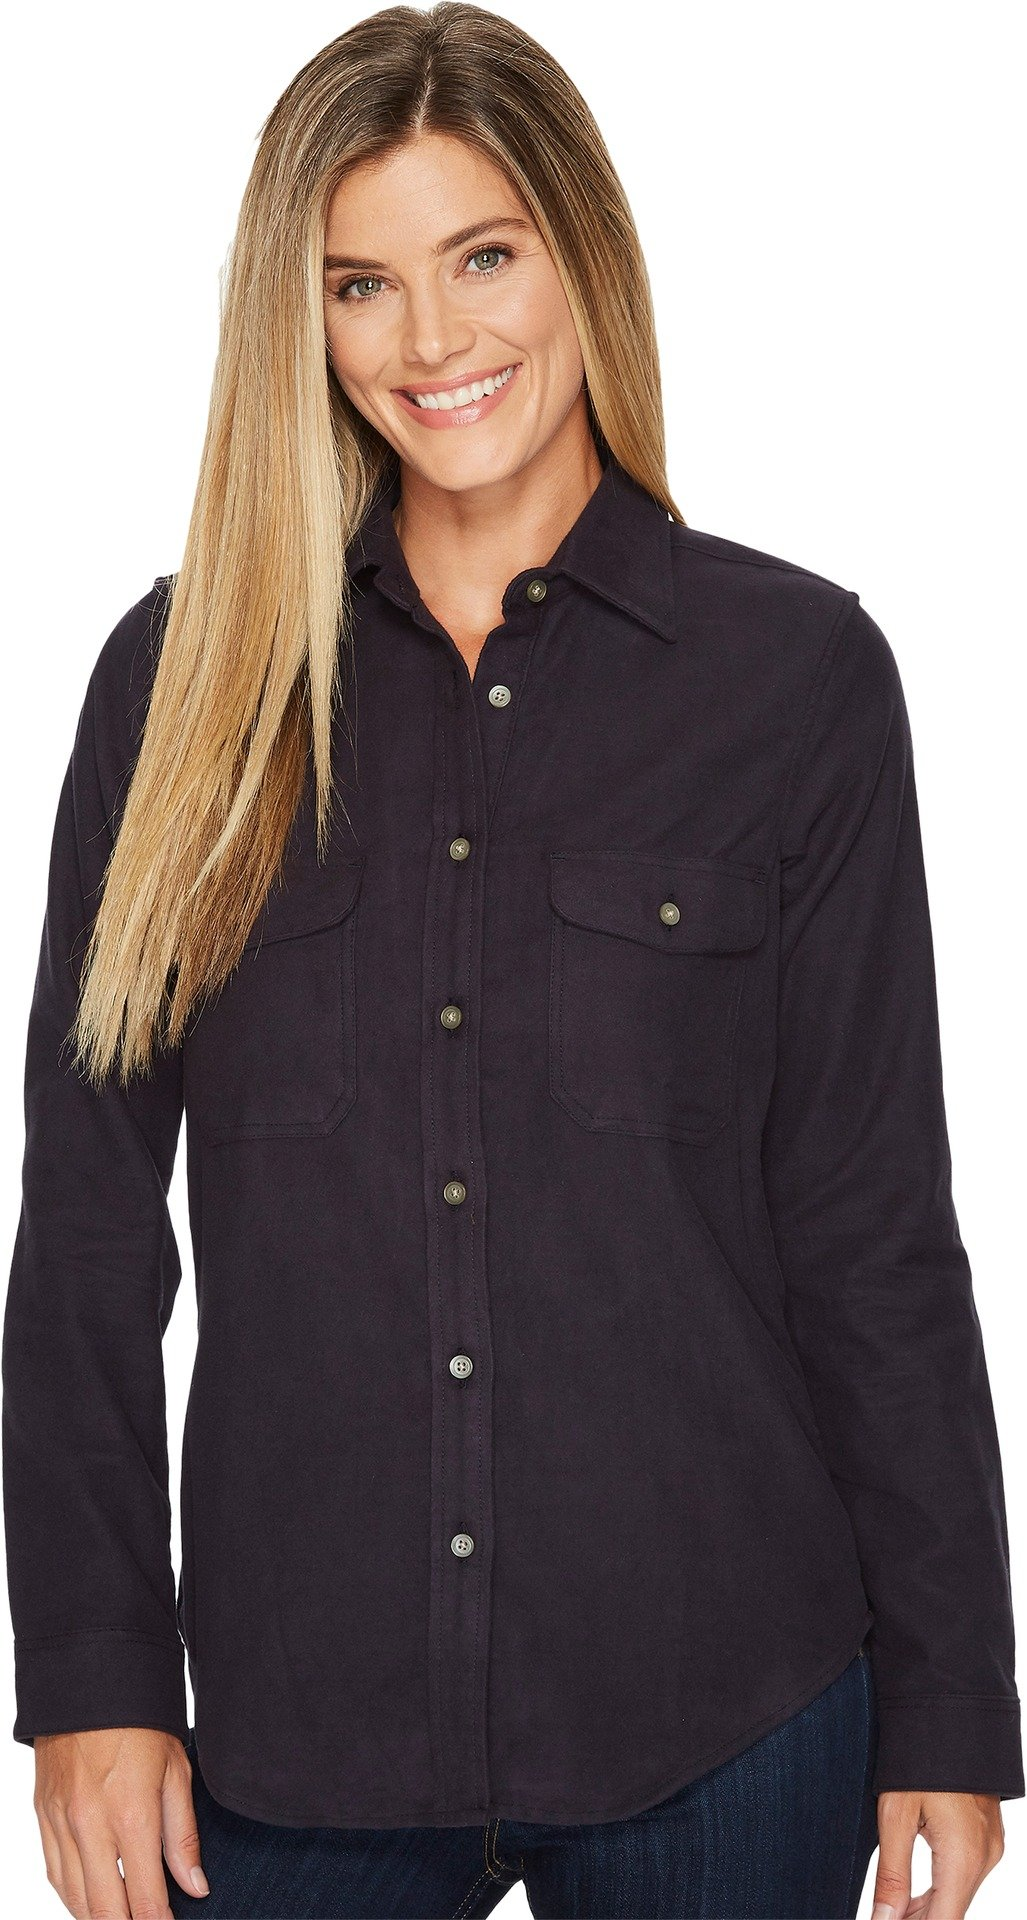 Filson Women's Moleskin Shirt Navy X-Large